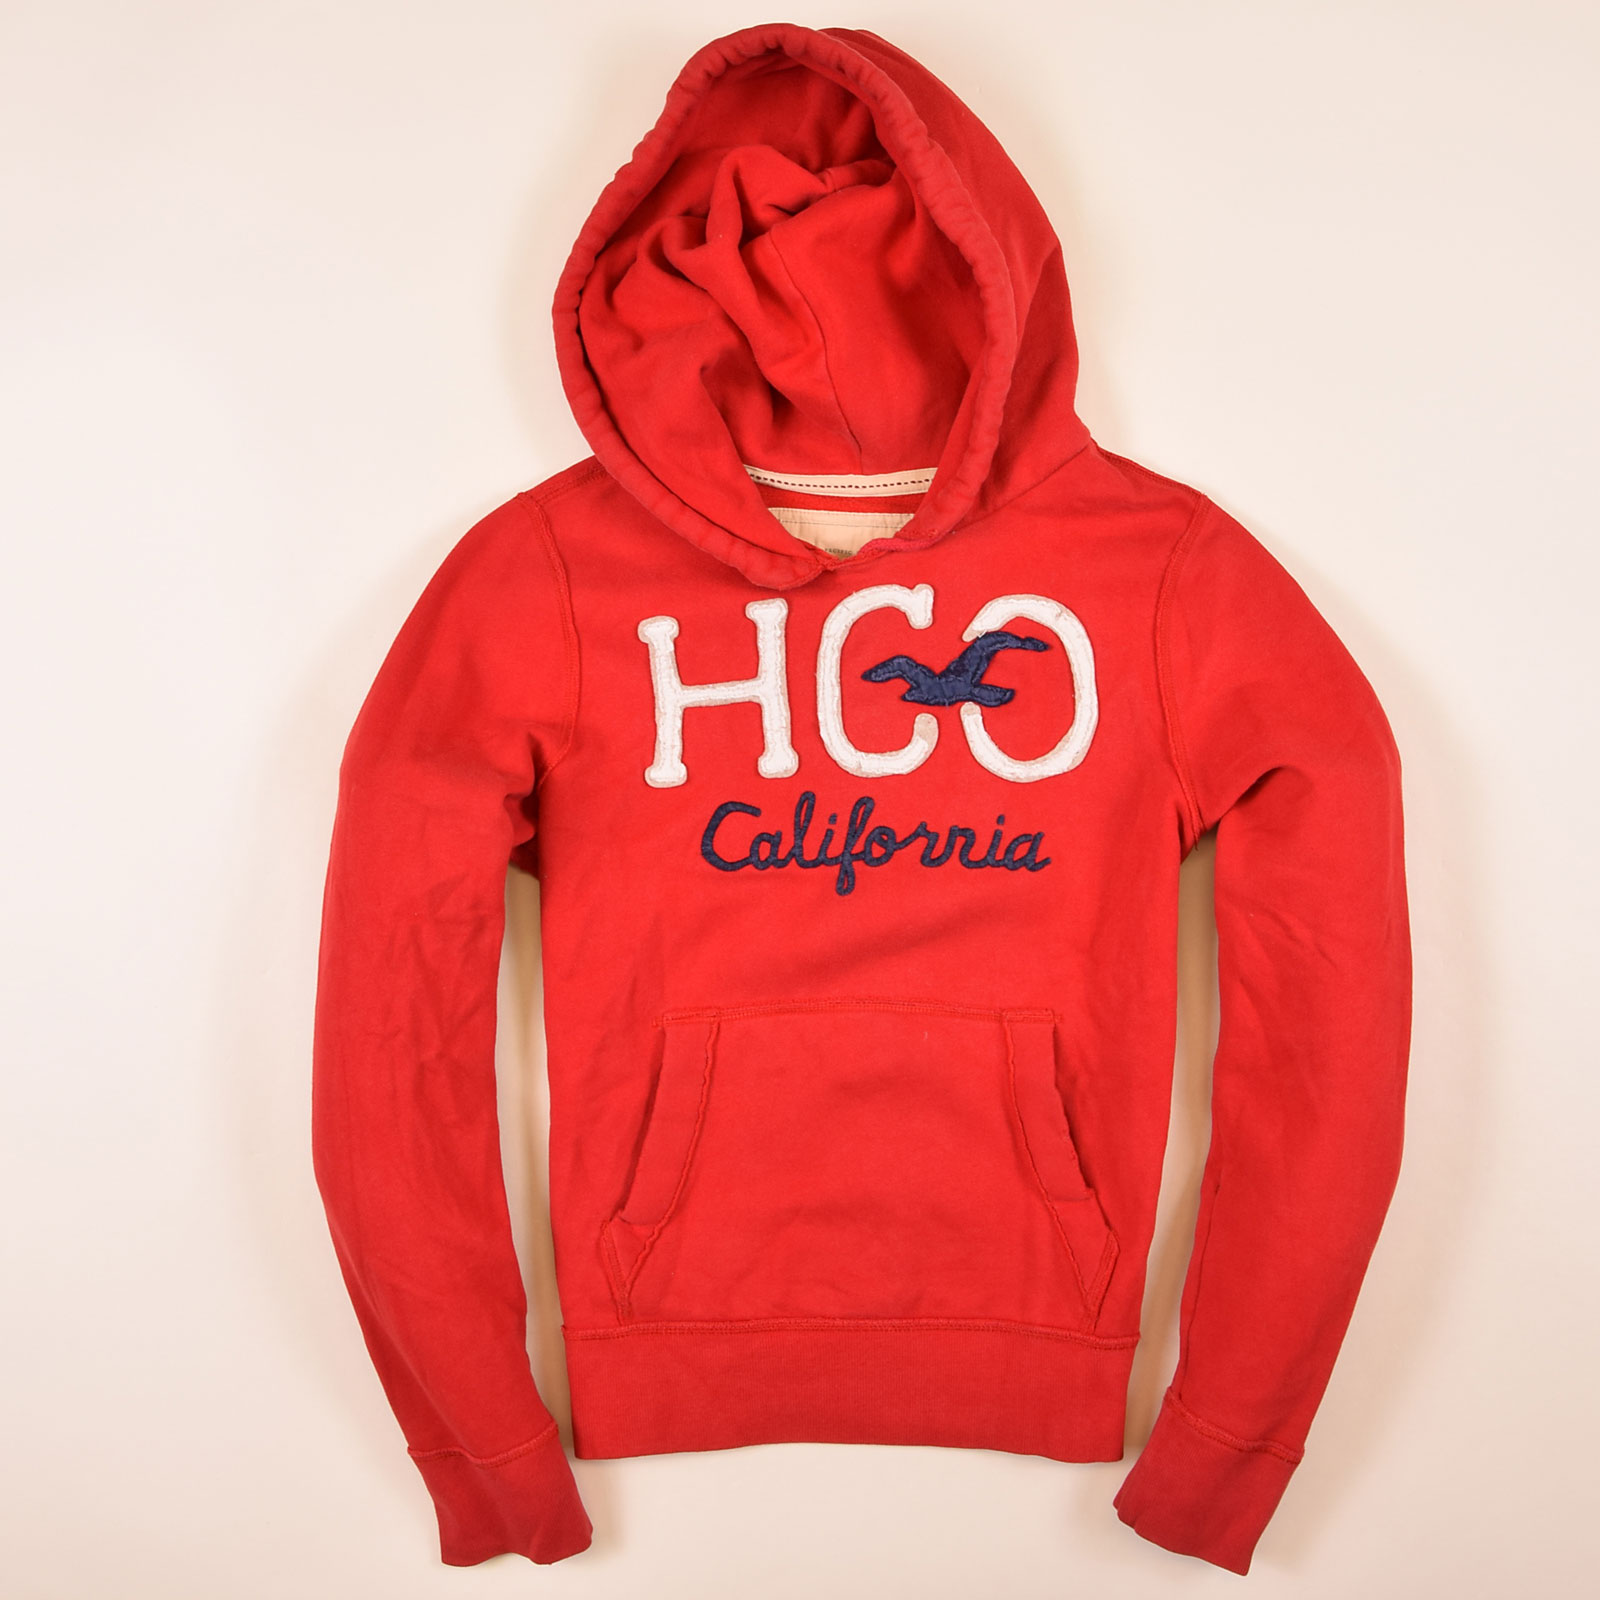 Details zu Hollister California Herren Hoodie Kapuzenpullover Gr.S Vintage HCO Rot, 69021